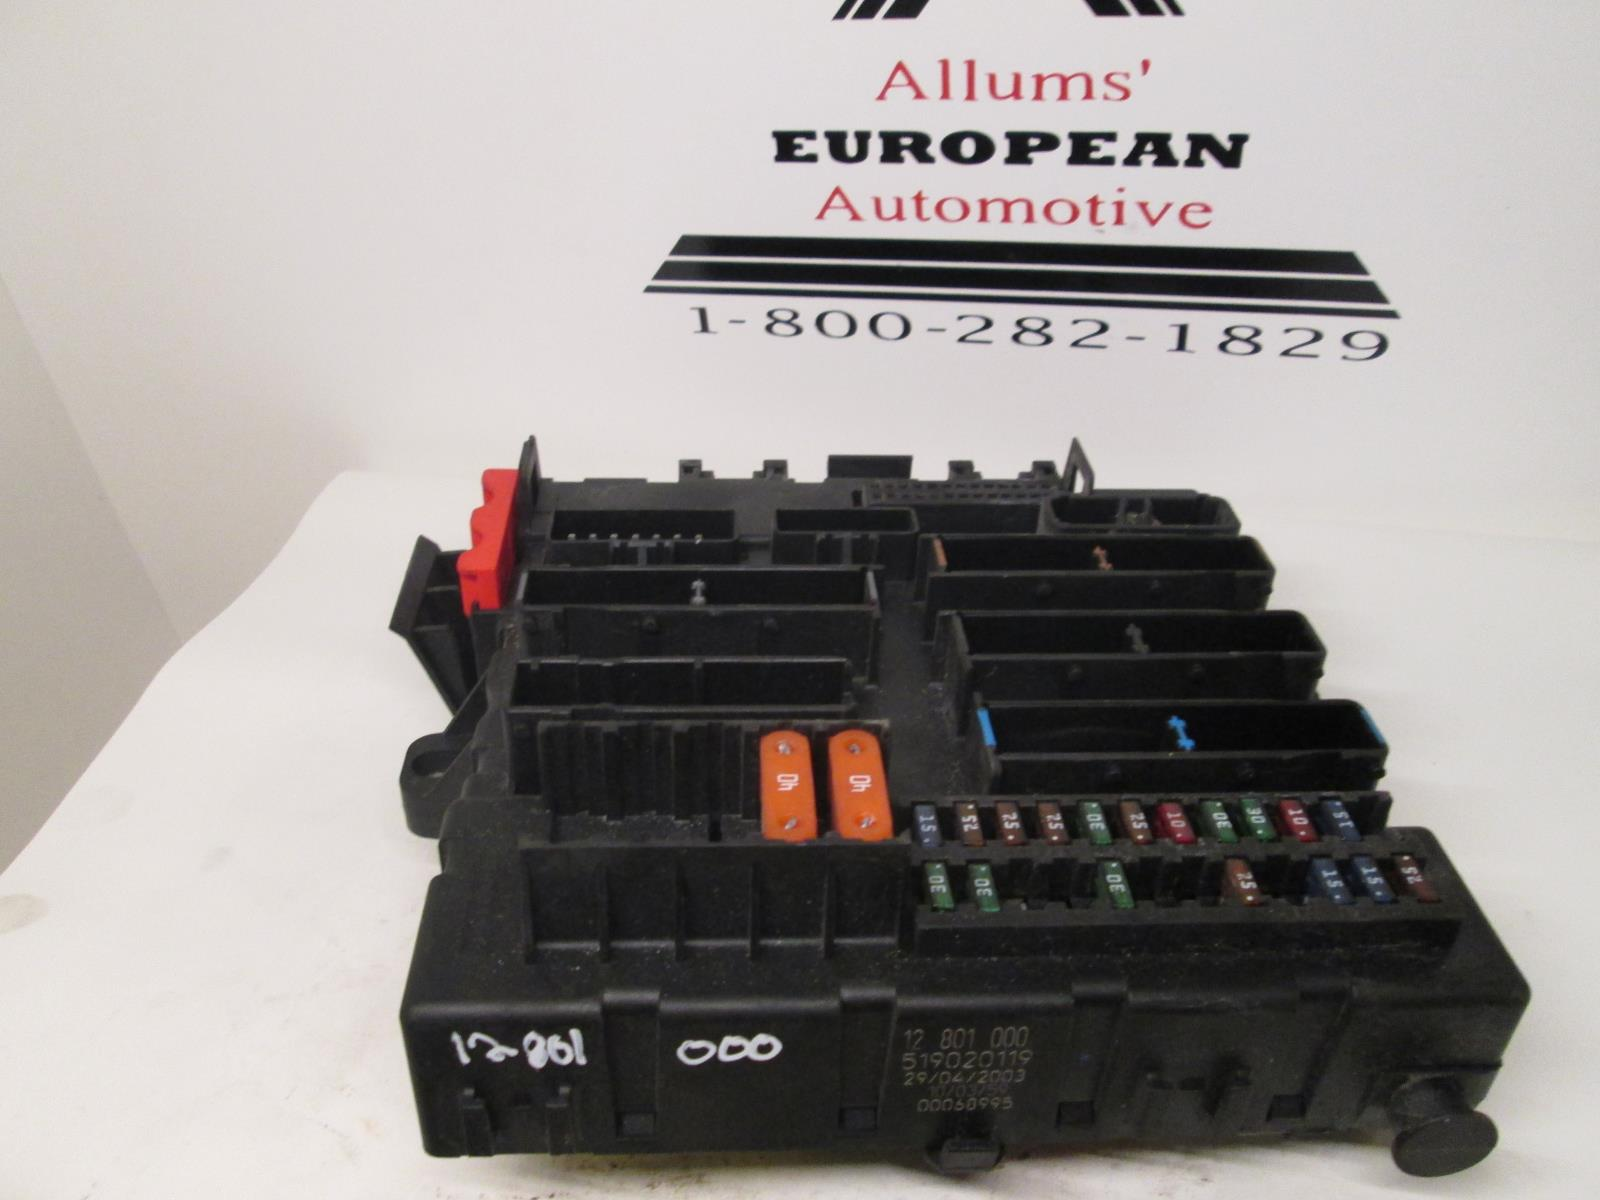 Saab 9 3 Rear Fuse Box 12801000 Allums Import 2003